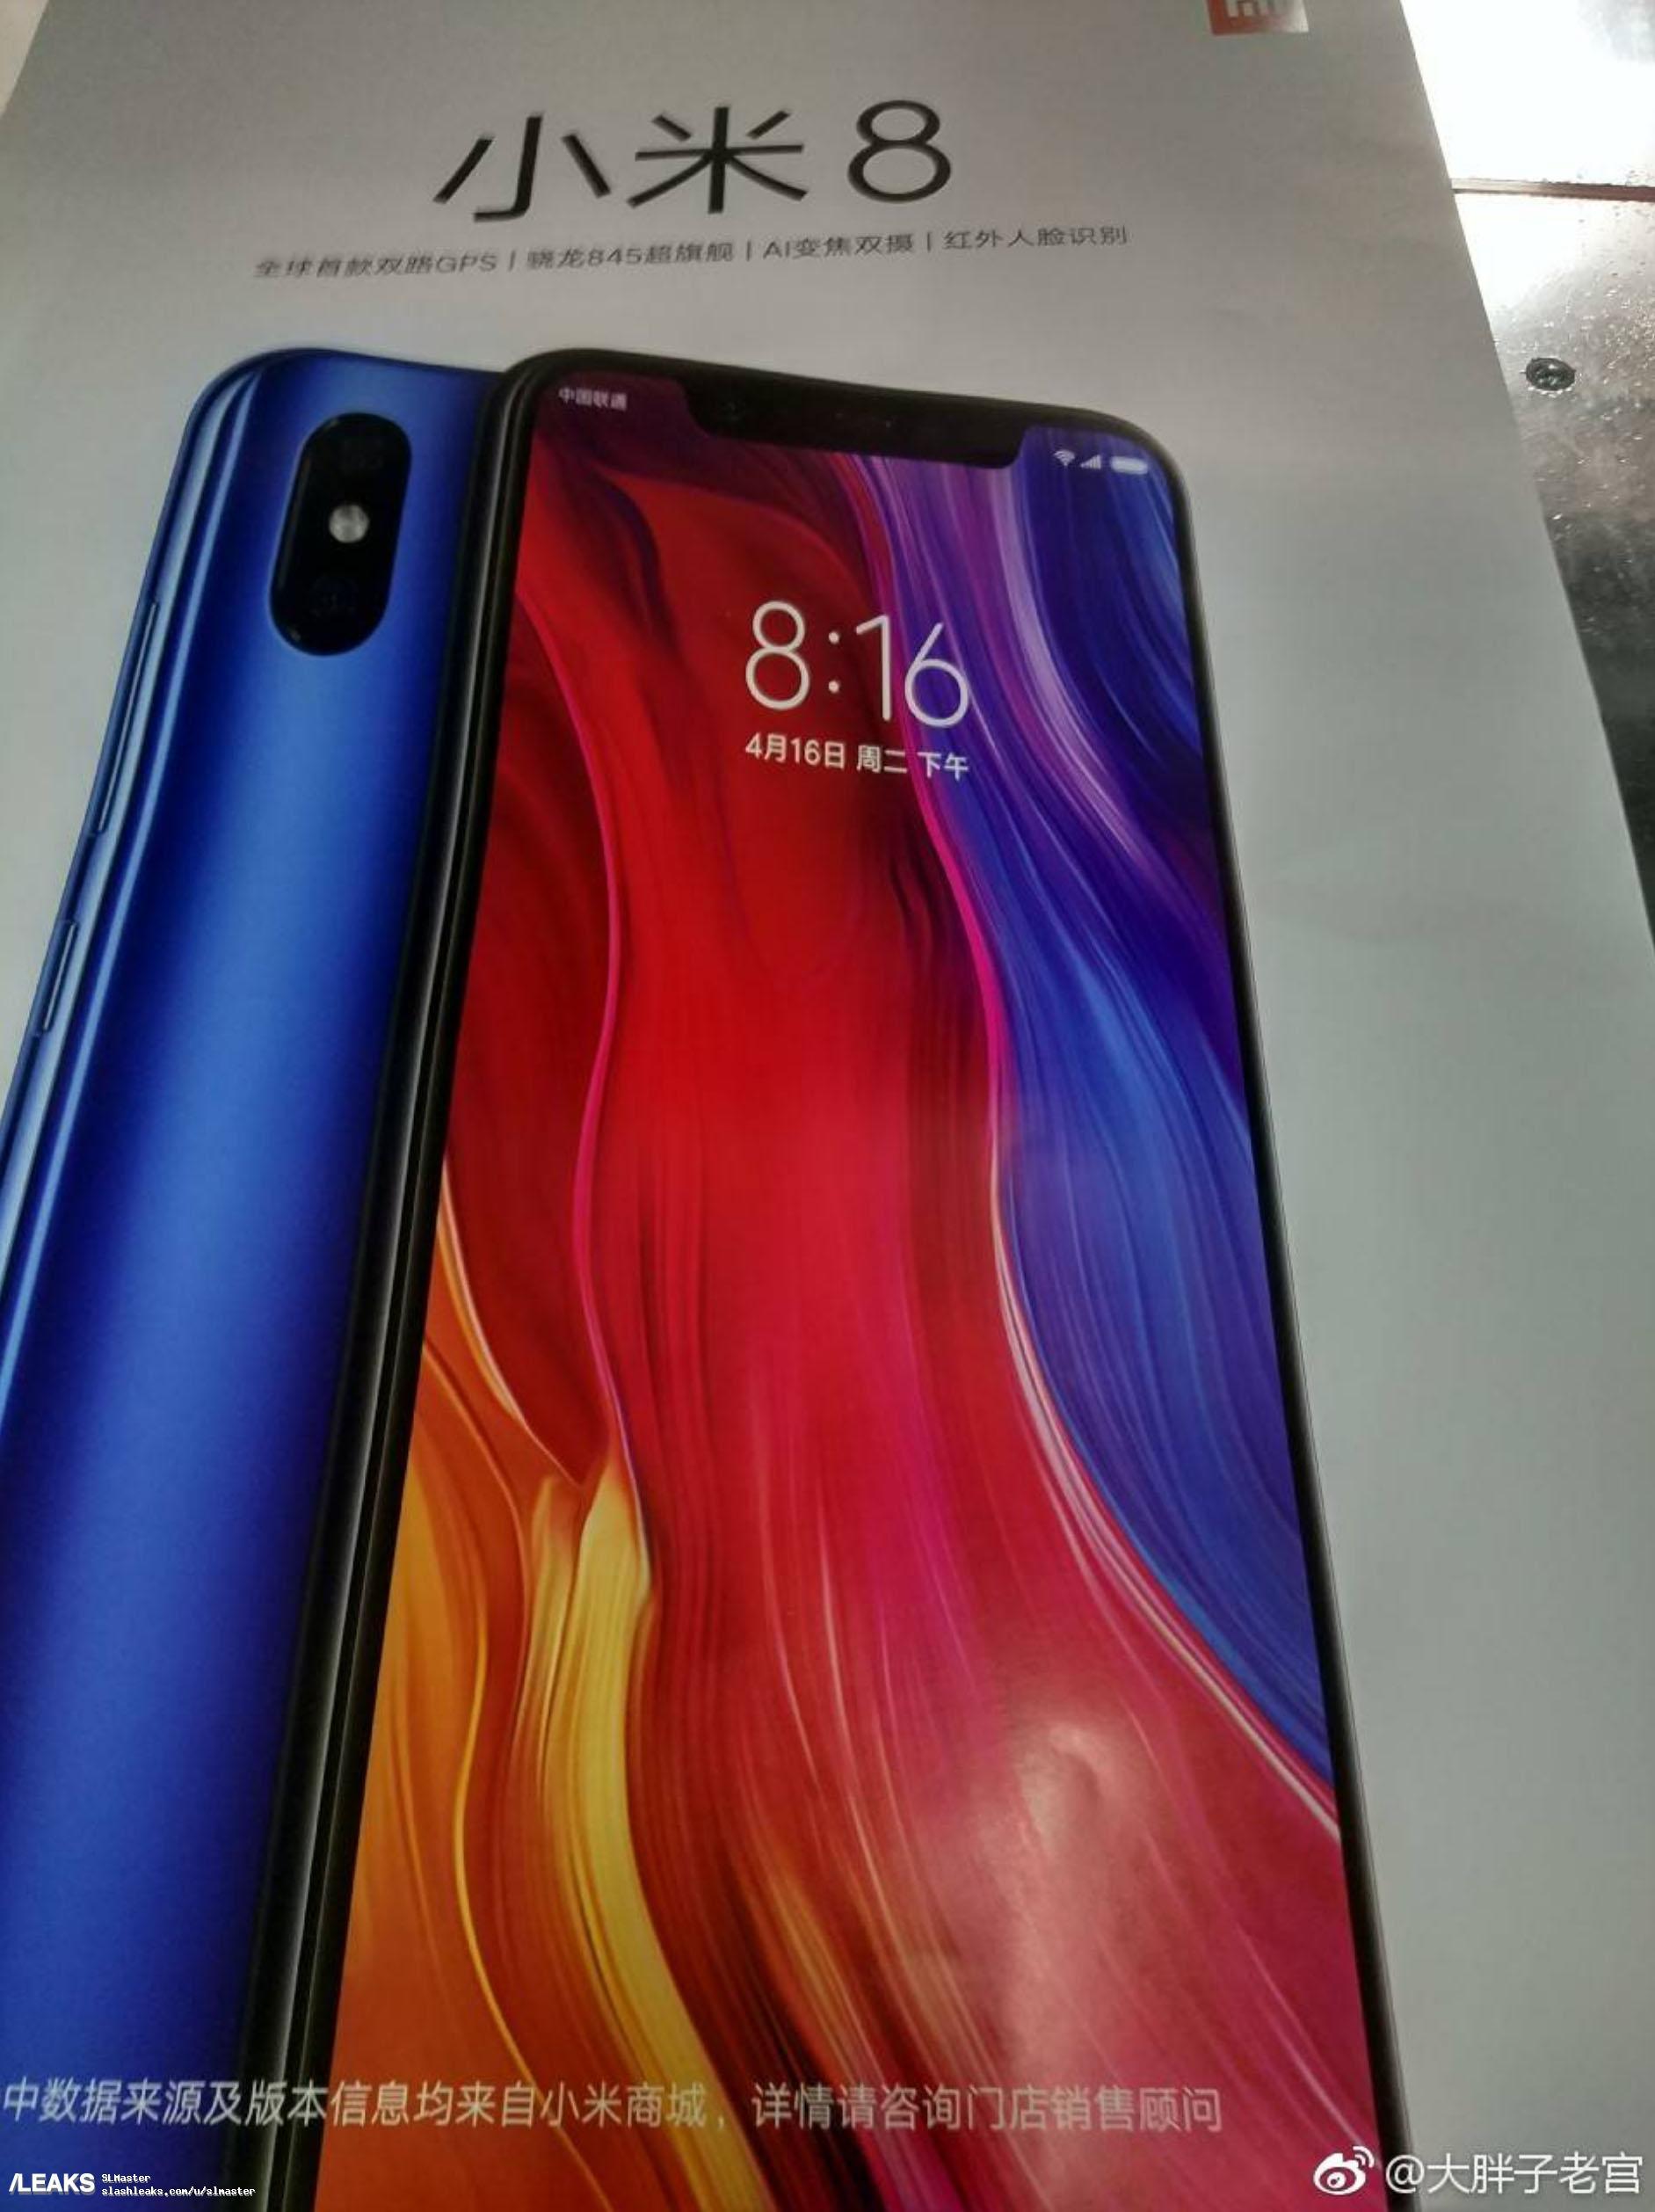 img Xiaomi Mi 8 poster leaked